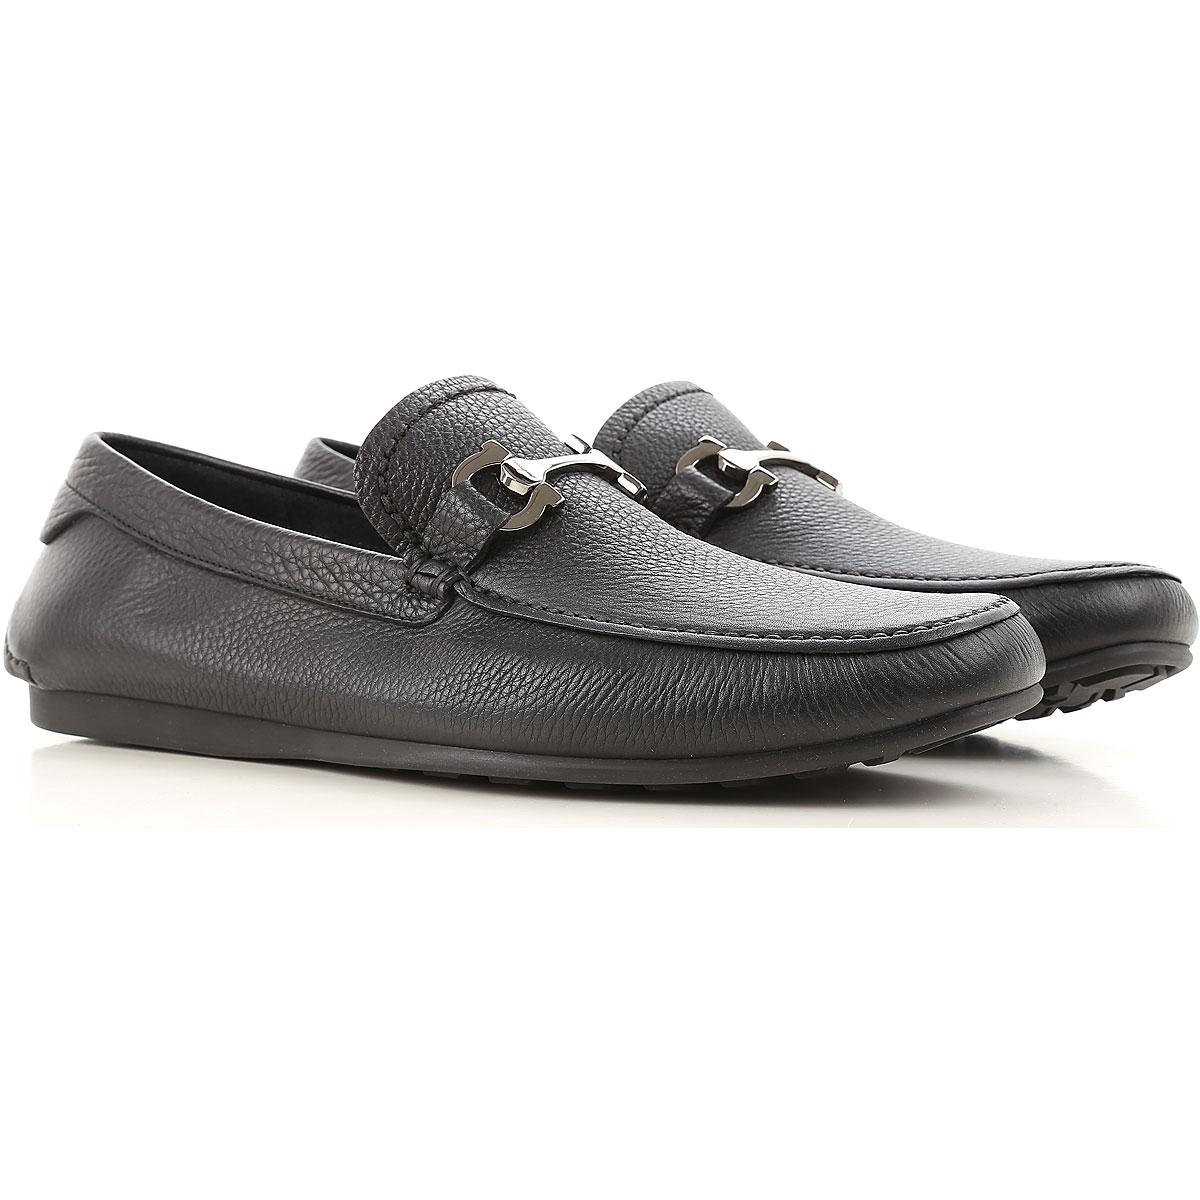 Image of Salvatore Ferragamo Loafers for Men On Sale, Black, Leather, 2017, 8 8.5